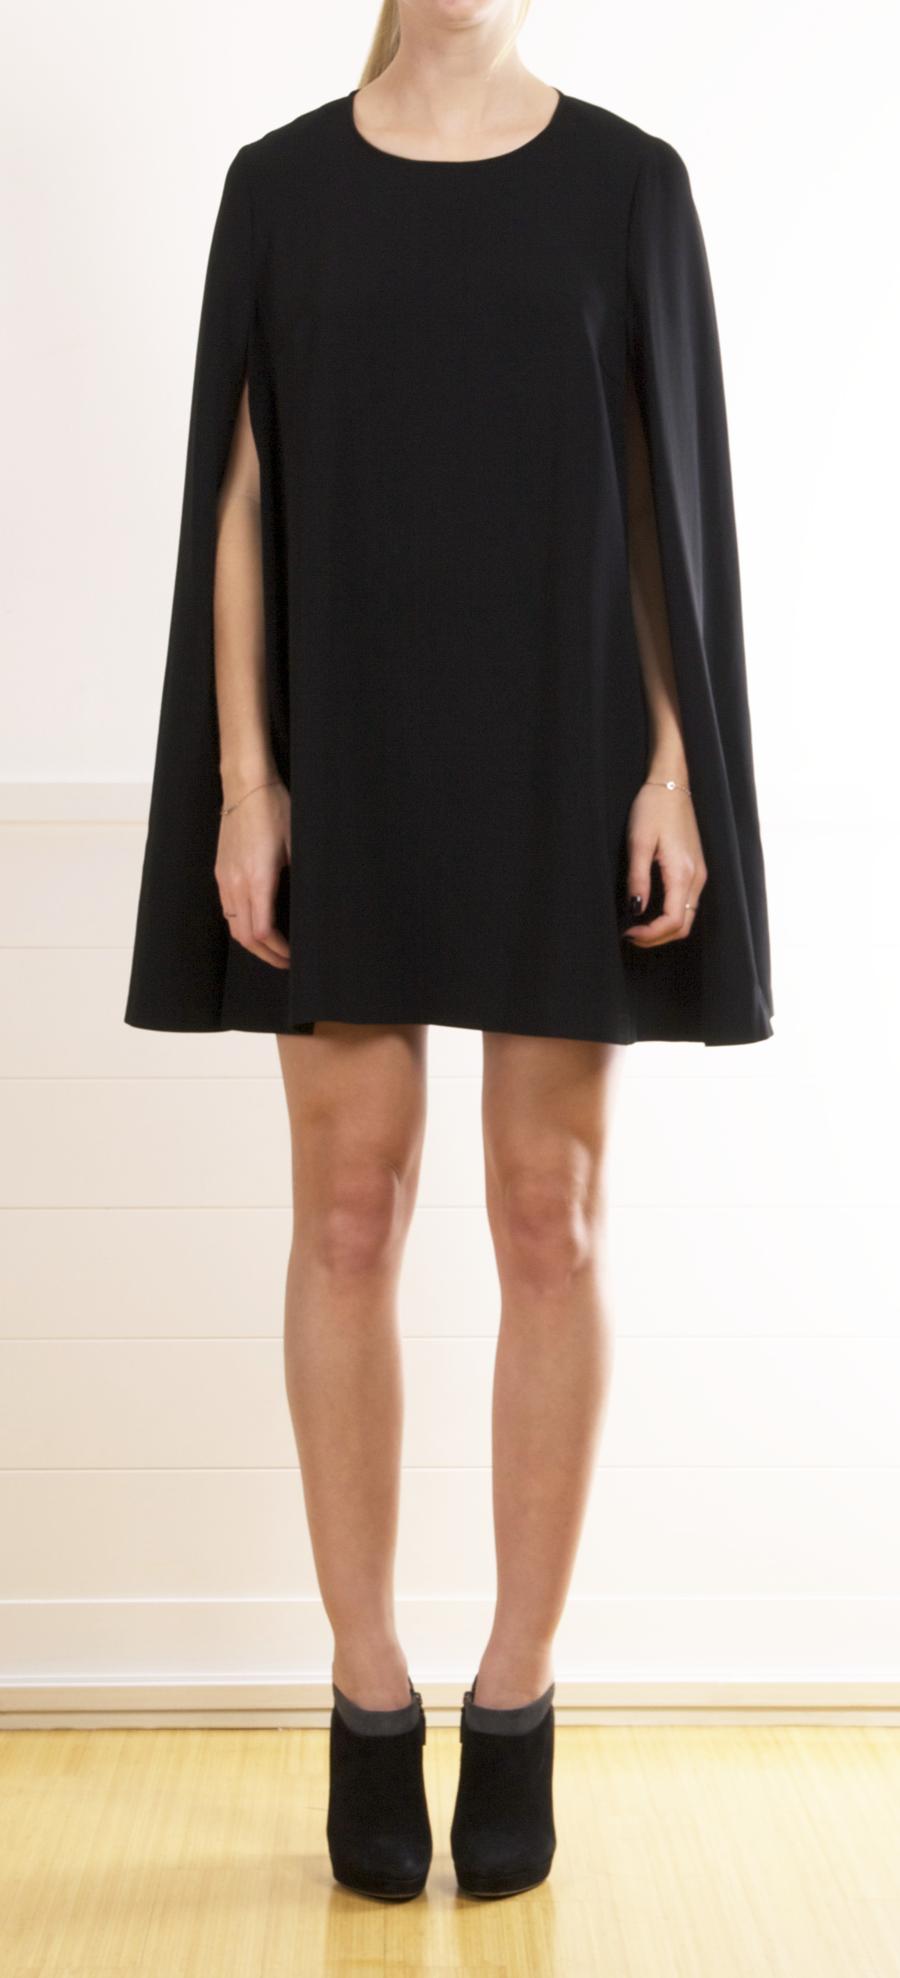 Dkny Woman Merino Wool-trimmed Velvet Maxi Dress Midnight Blue Size S DKNY oNC4syJ